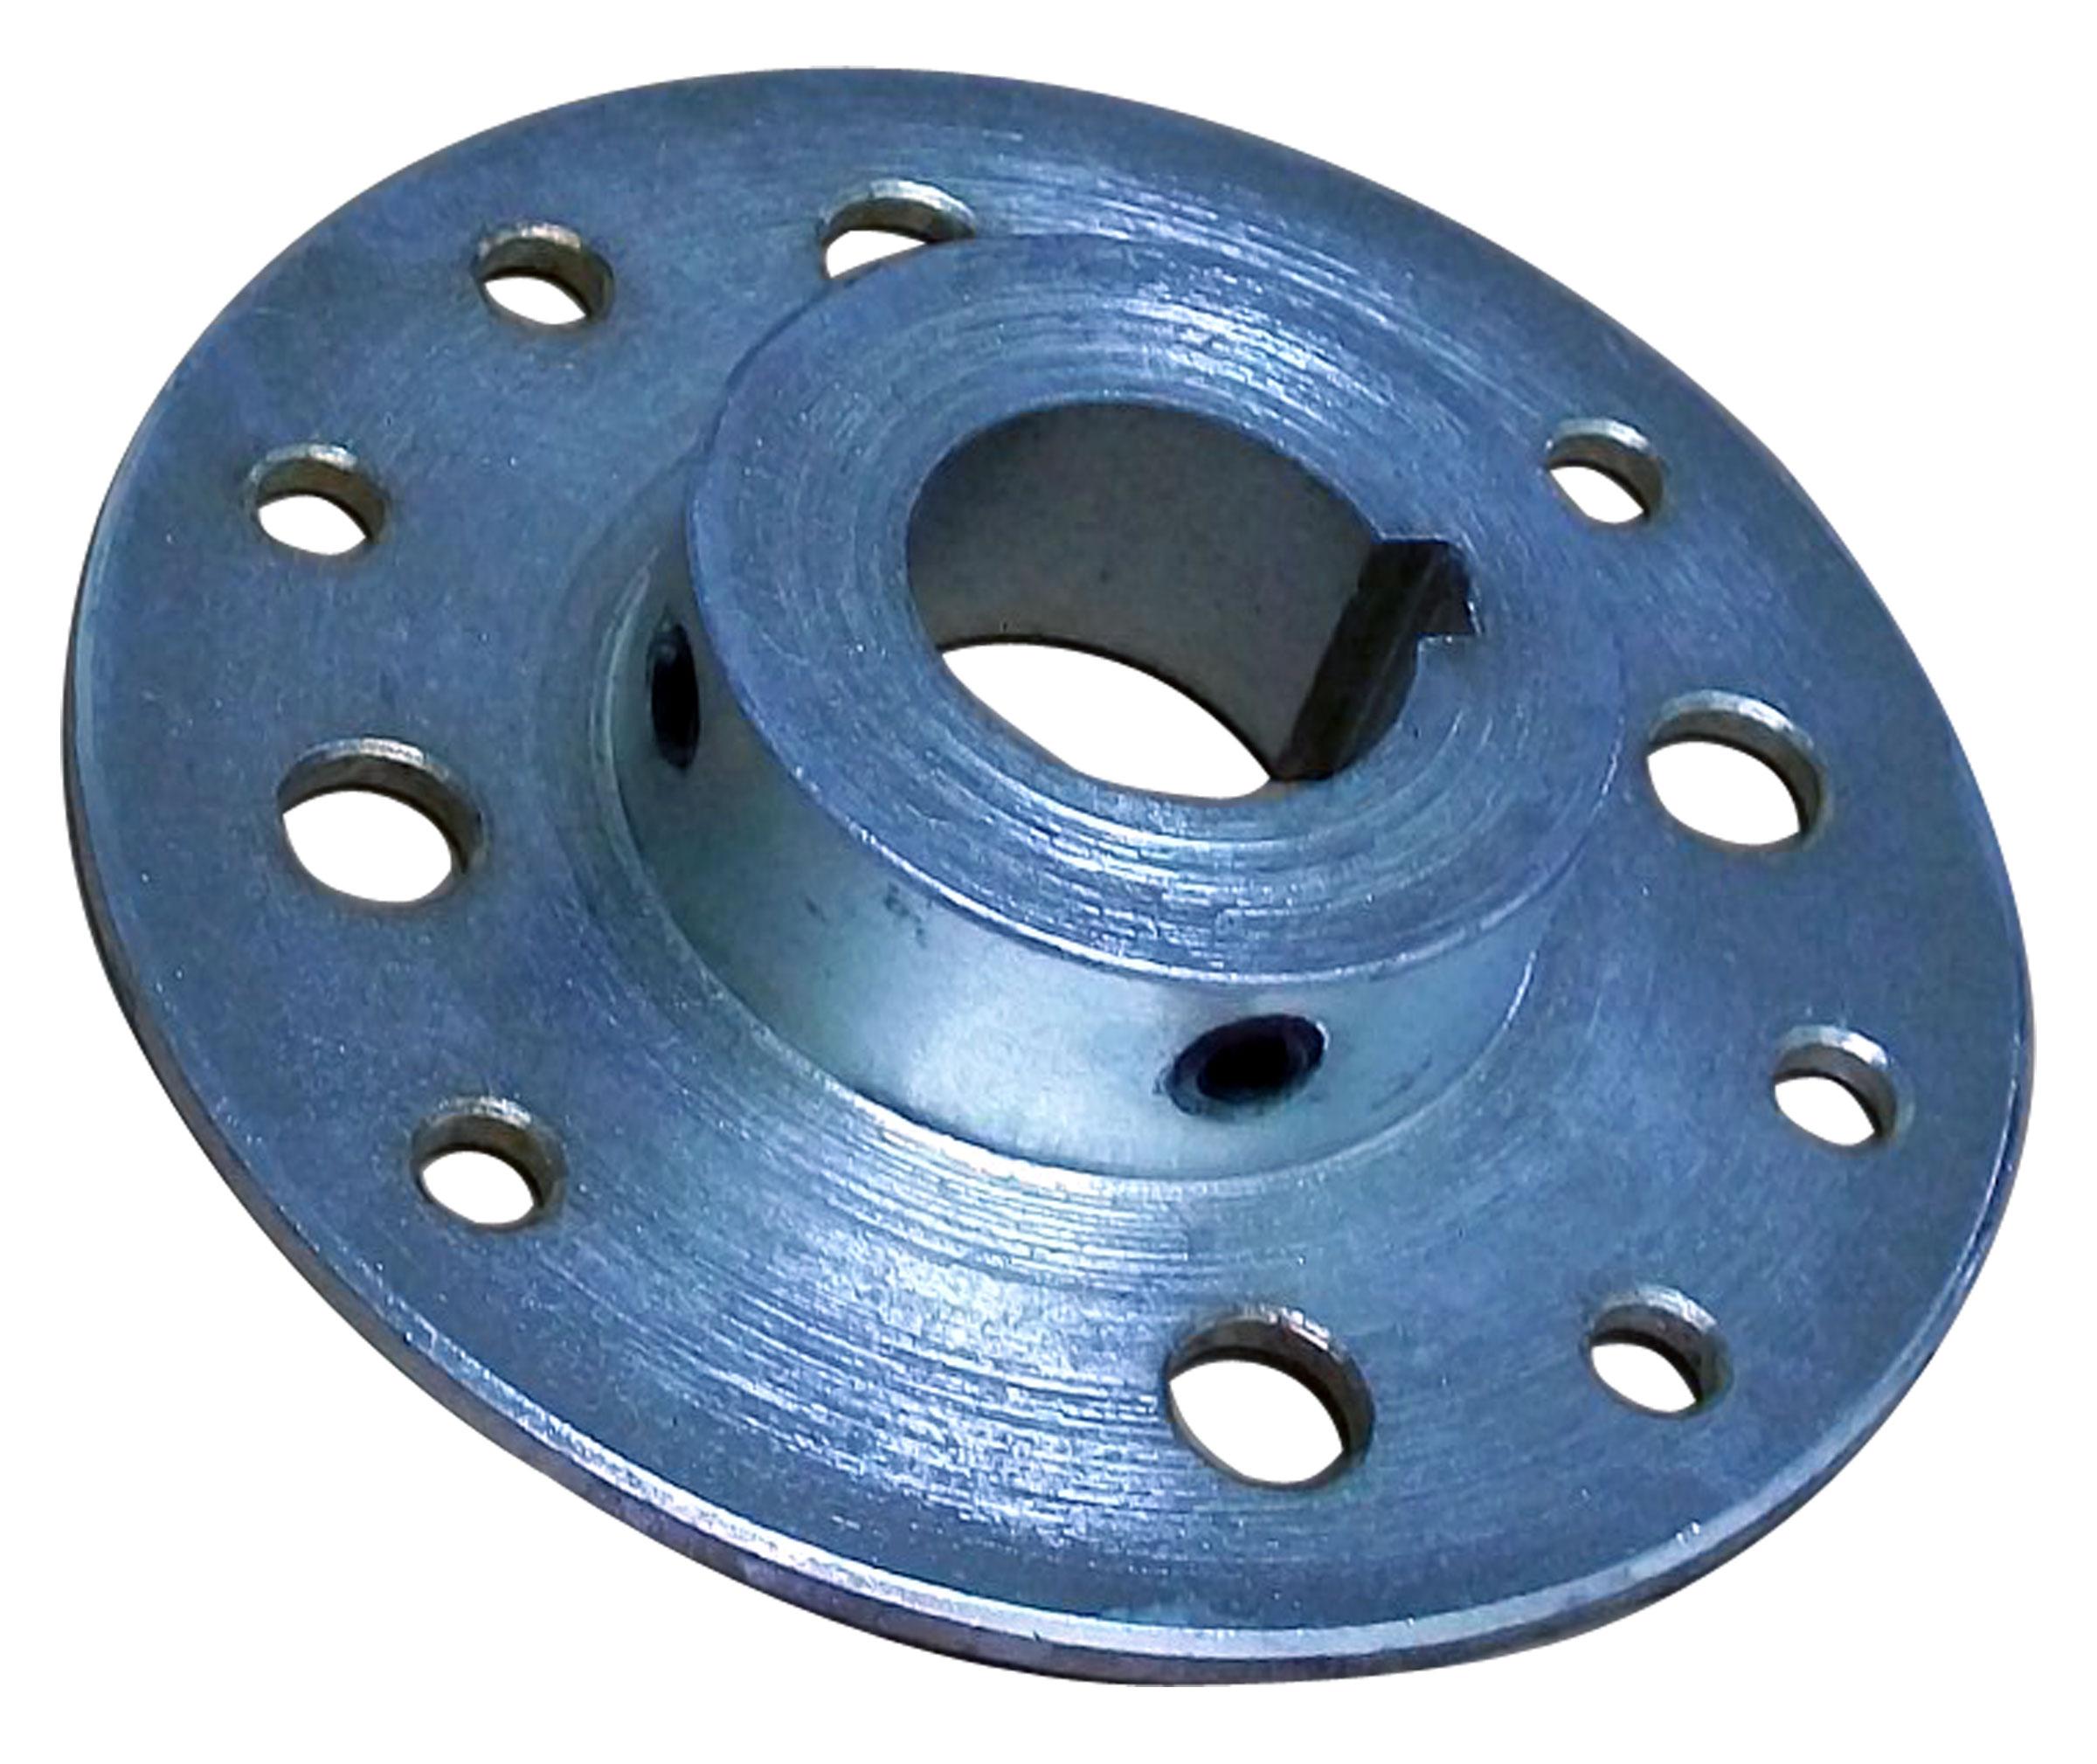 Steel Multi-Patterned Sprocket / Brake Hub (1